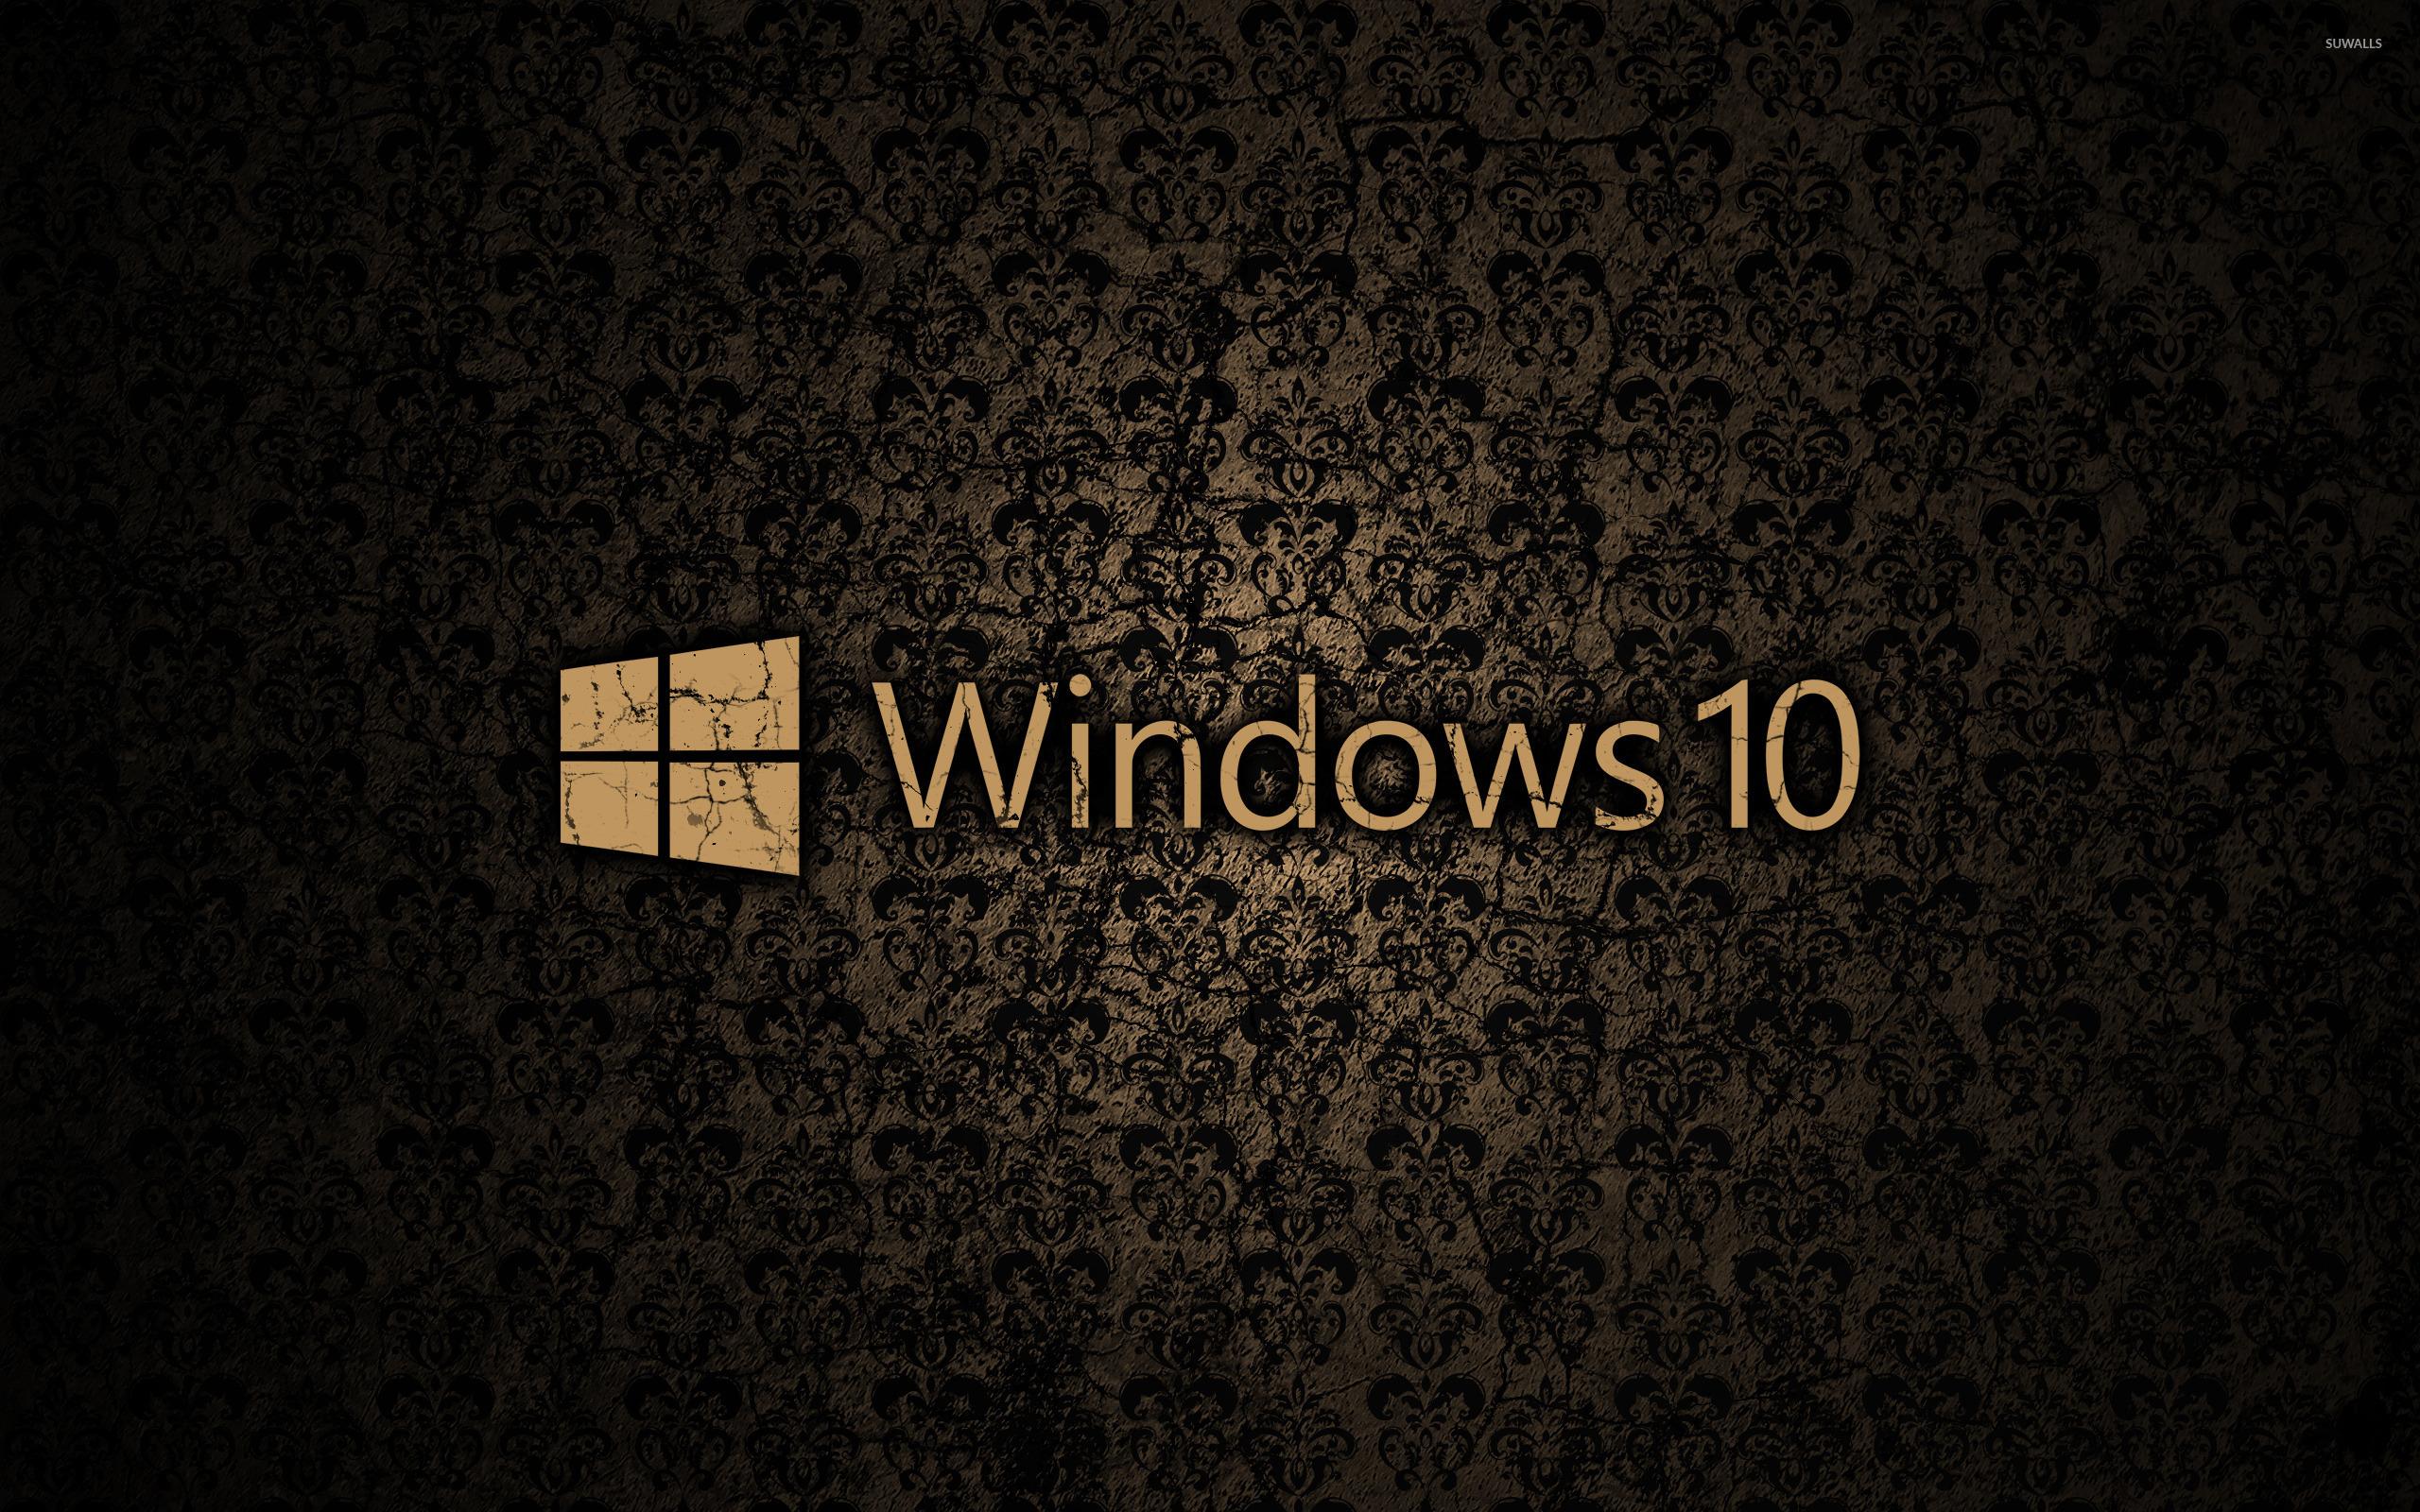 Windows 10 wallpaper - Computer wallpapers - #45261